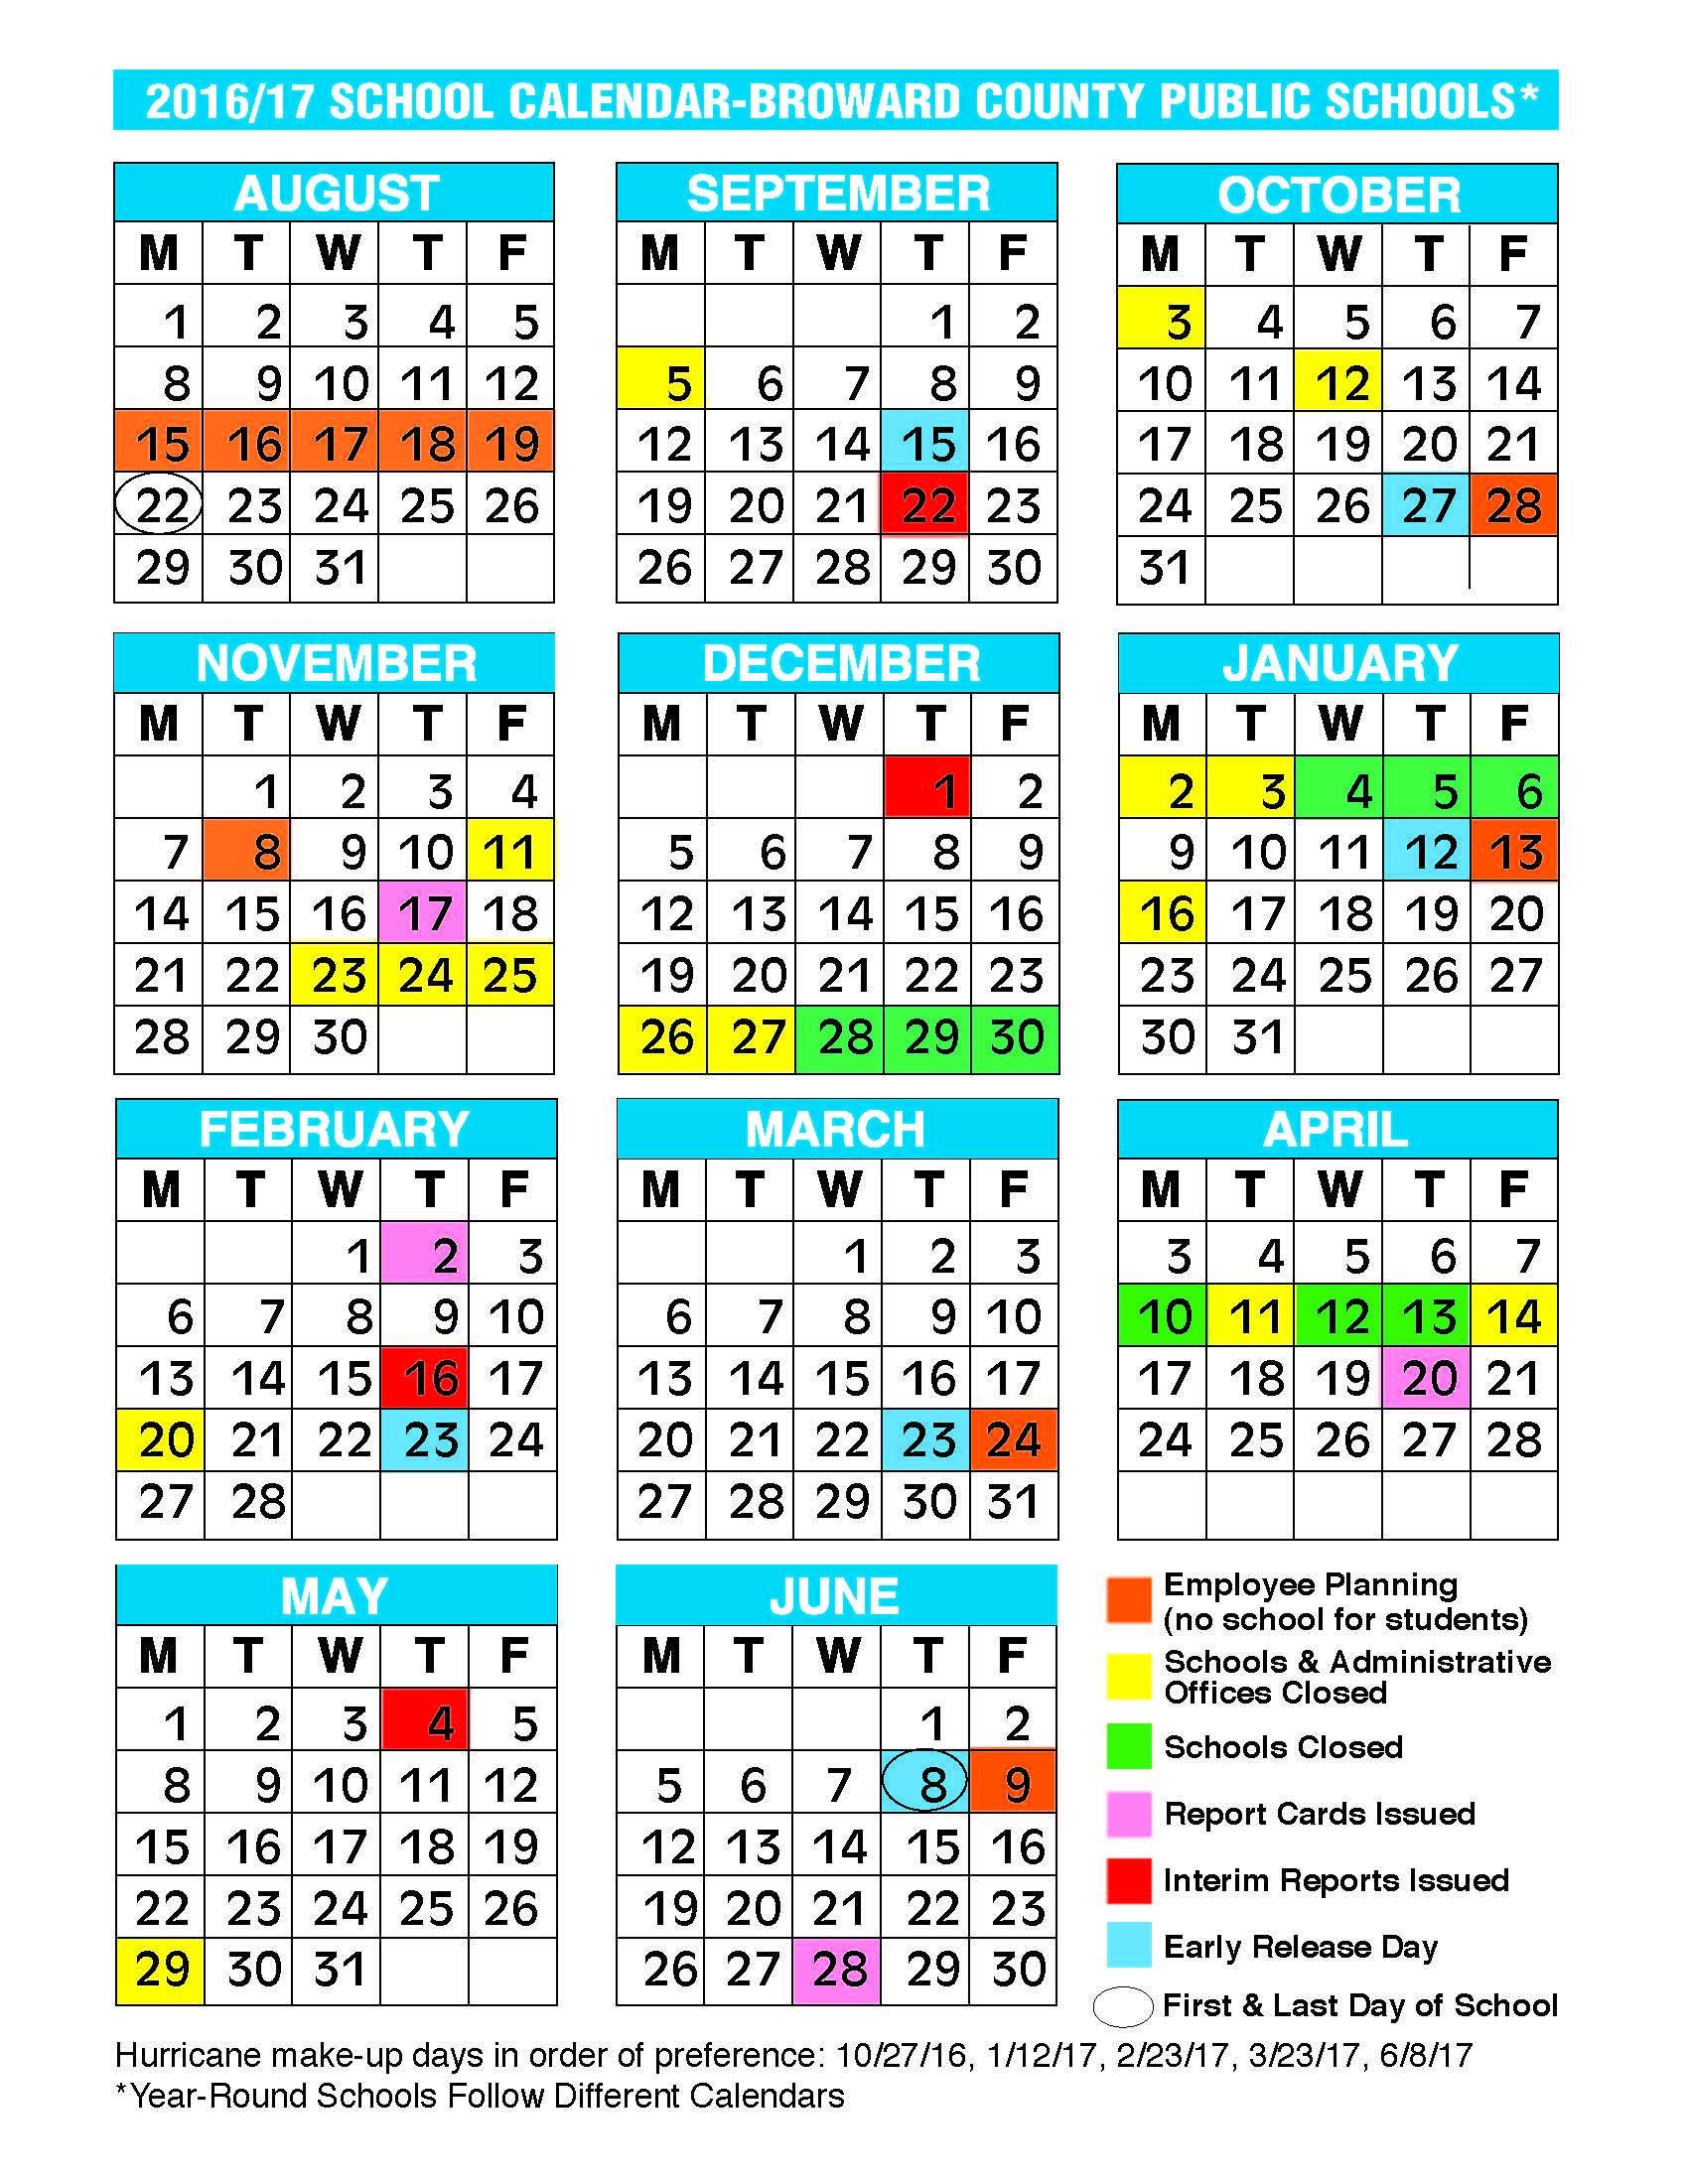 2017 2018 School Calendar Broward 2017 2016 School Calendar Broward